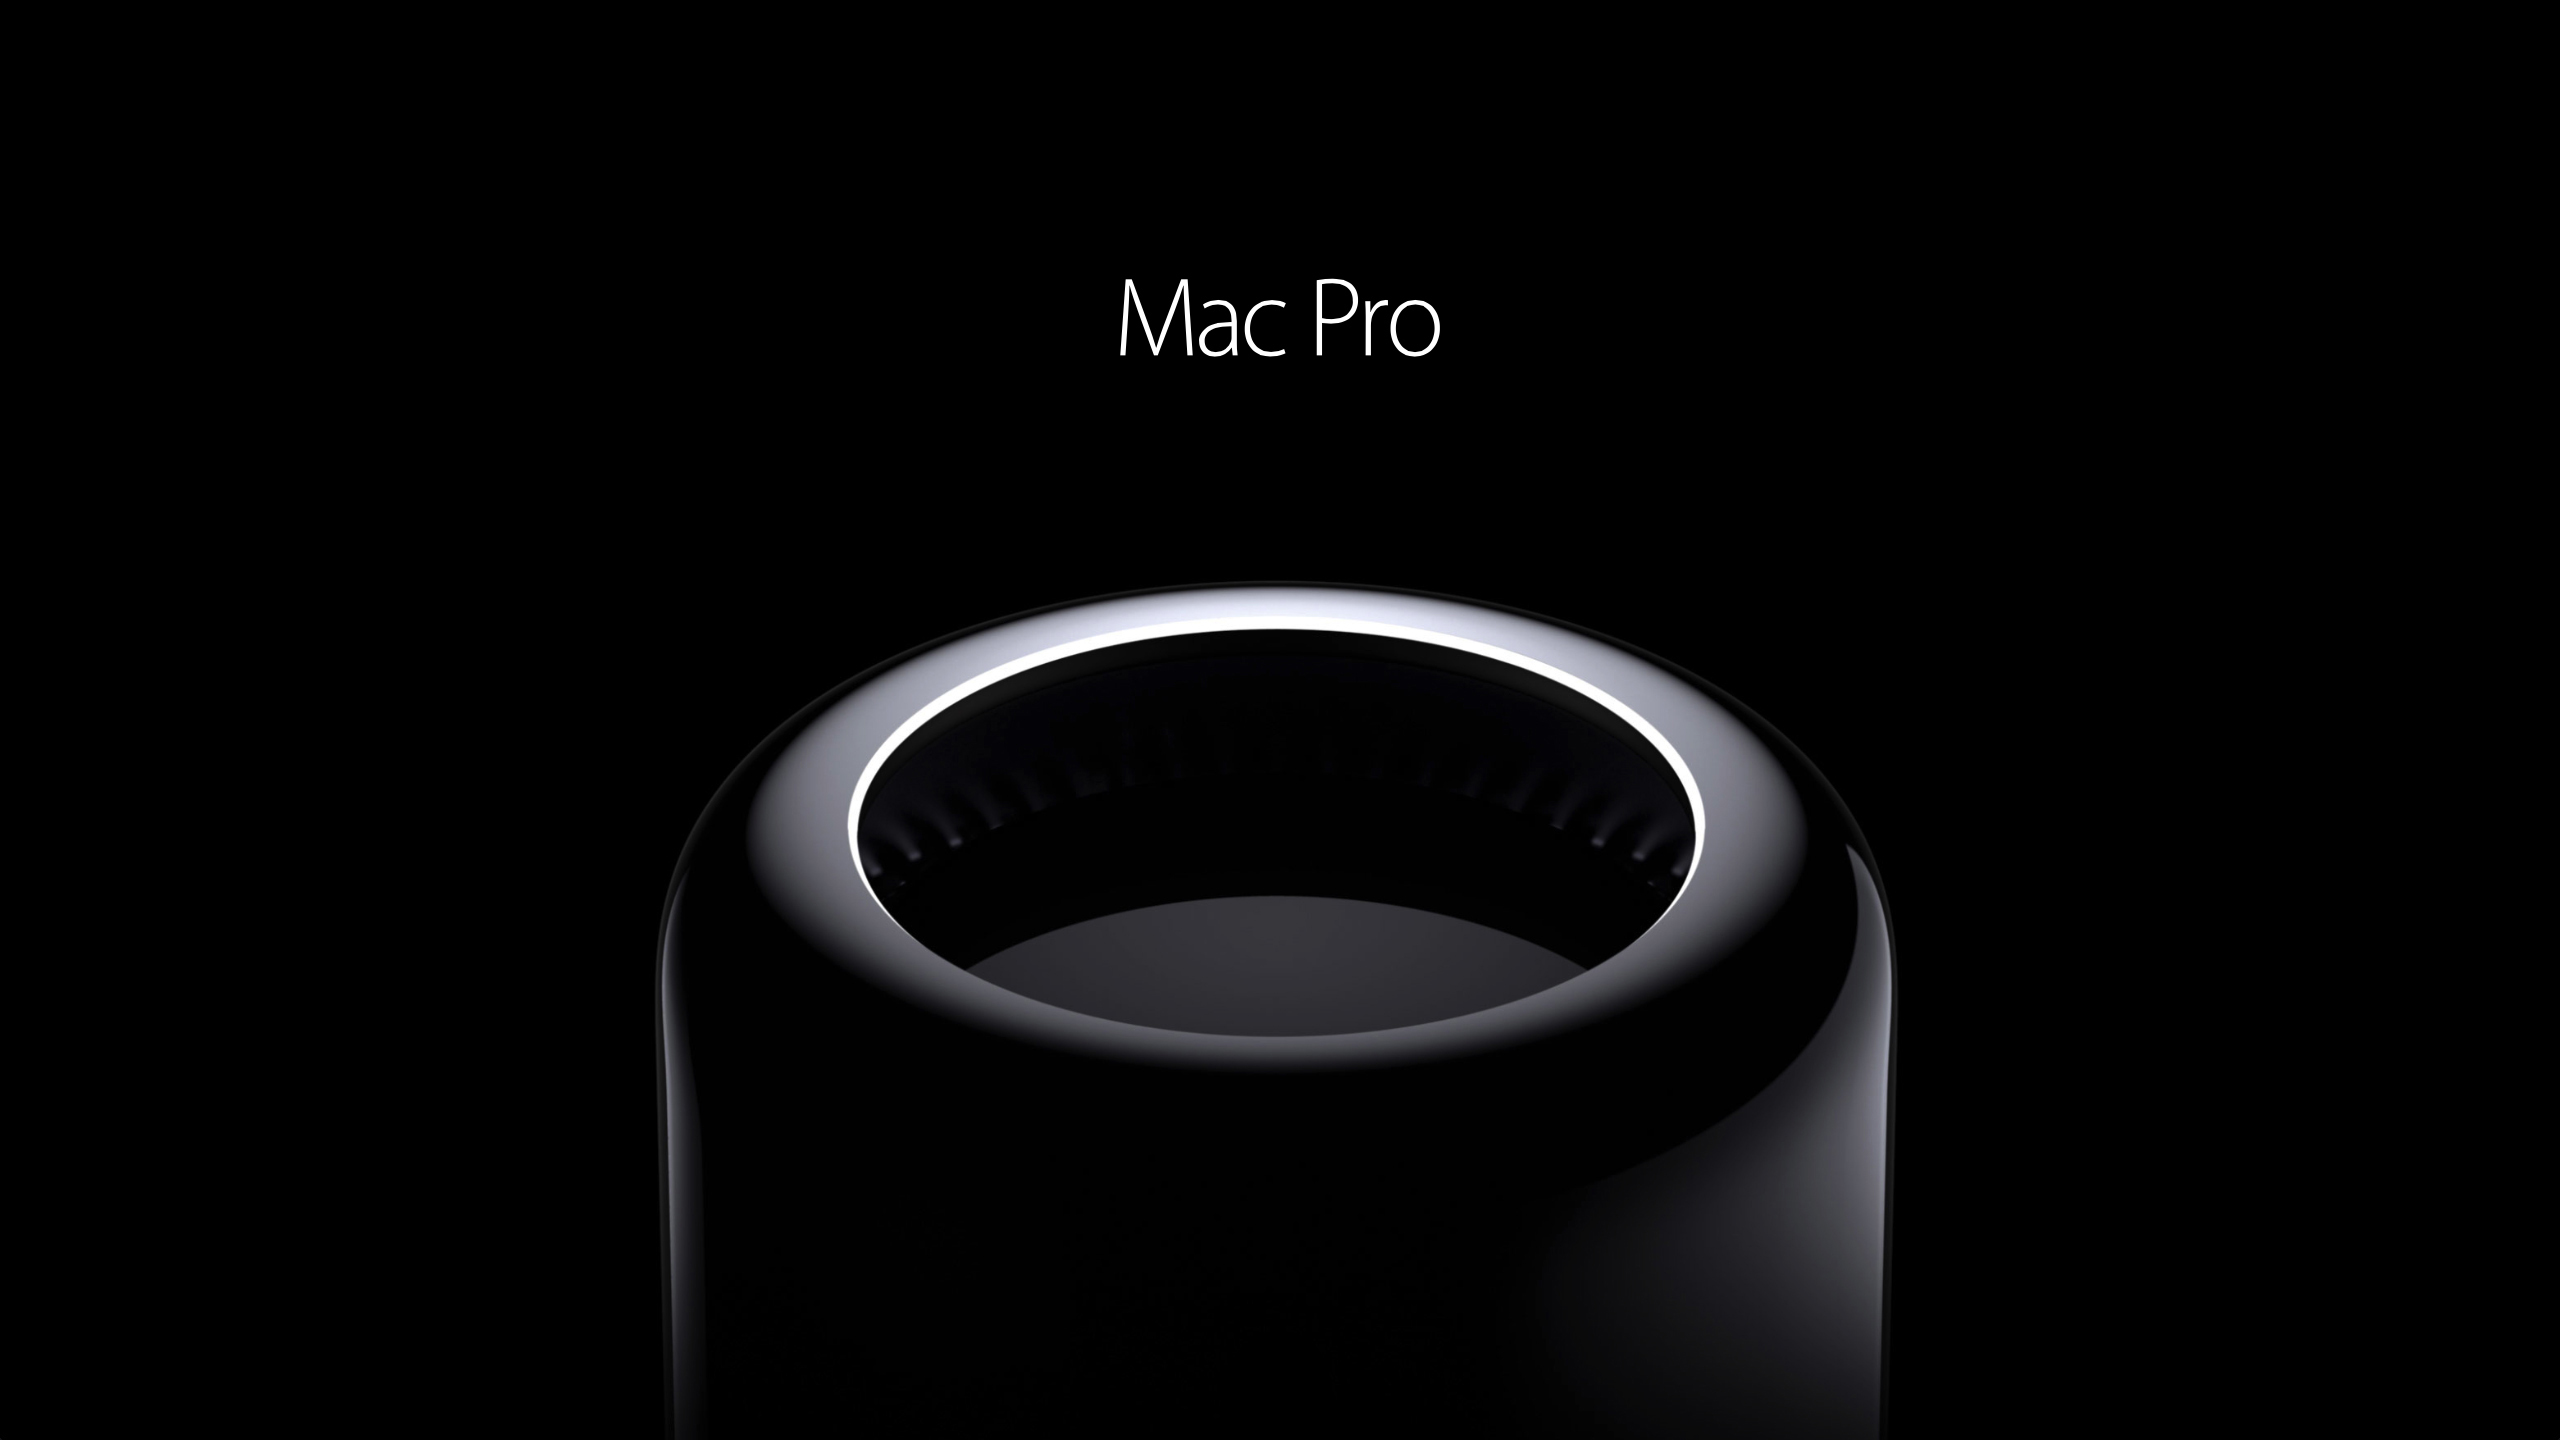 Download wallpaper apple mac pro 2014 gloss black black background 2560x1440